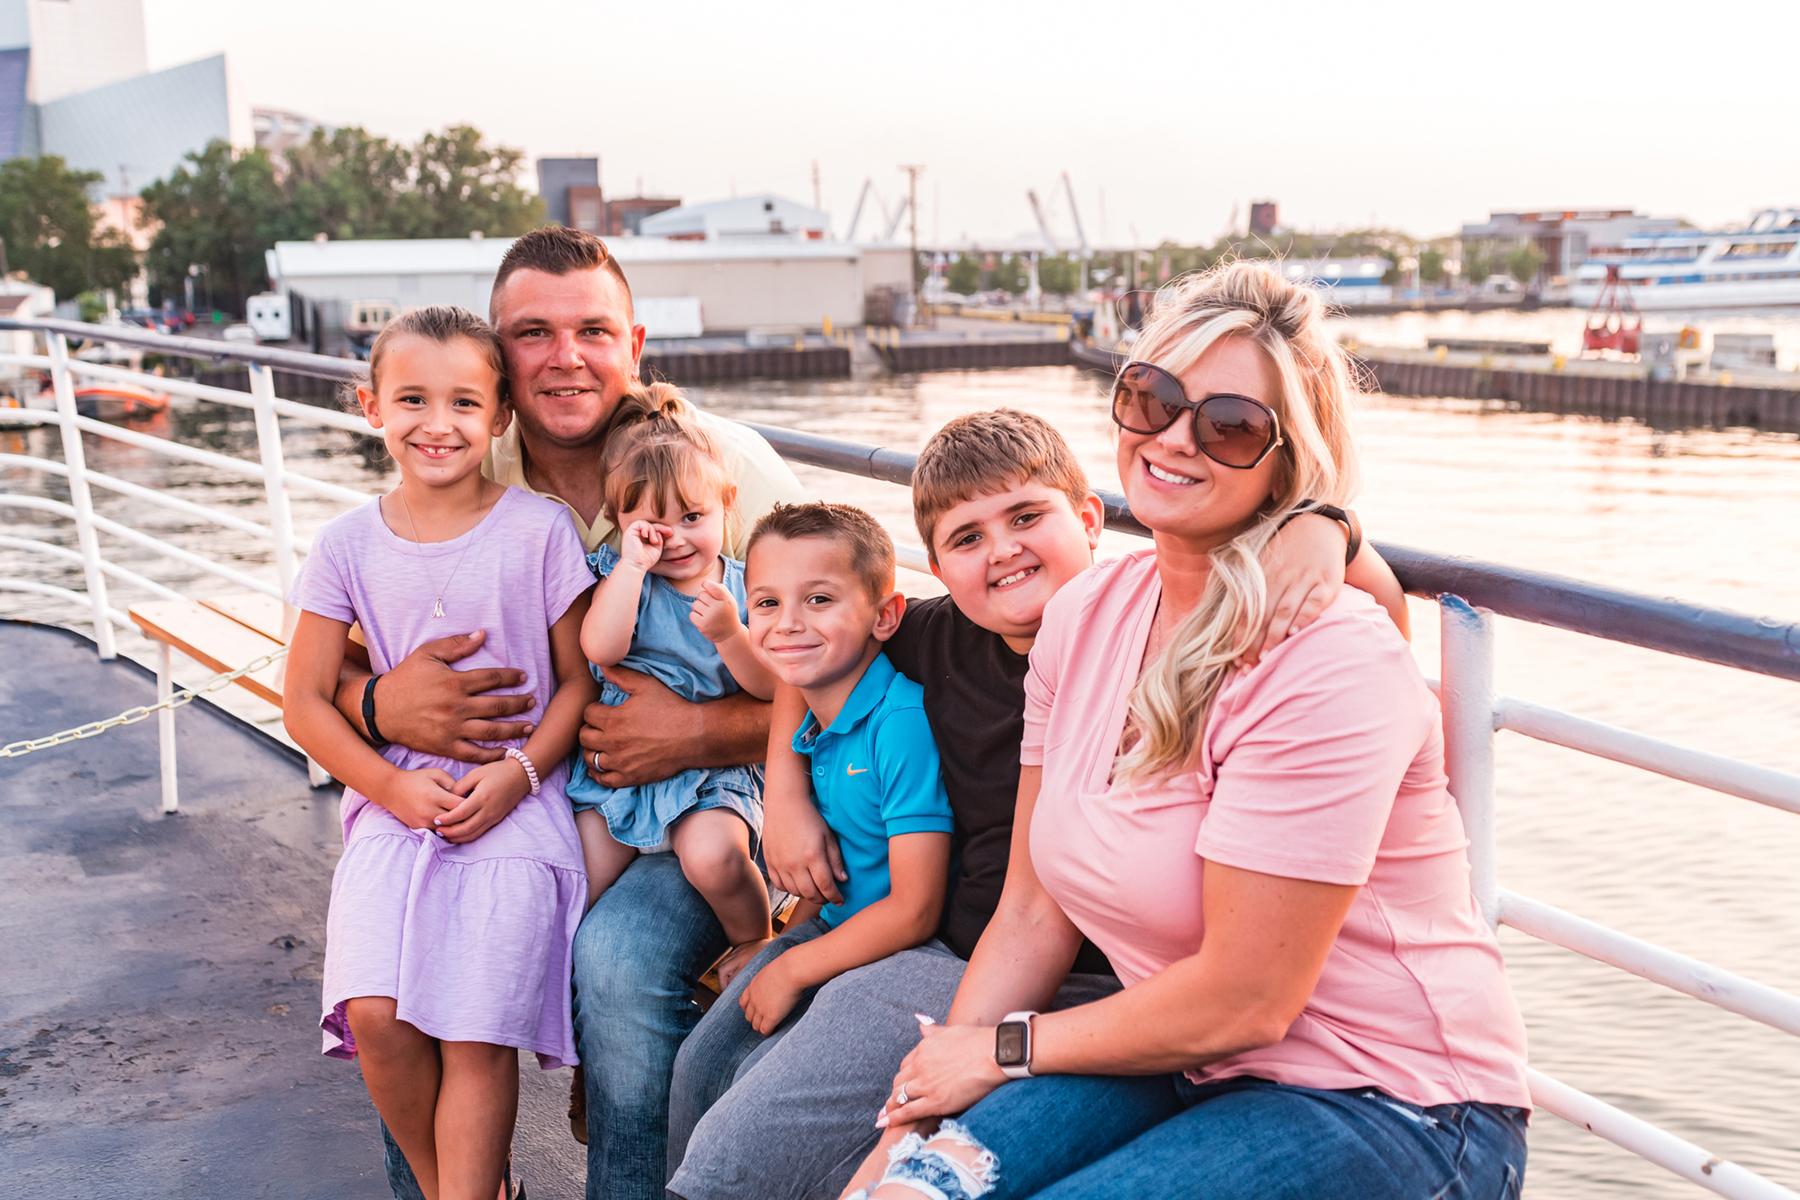 Nautica Queen Family on Deck